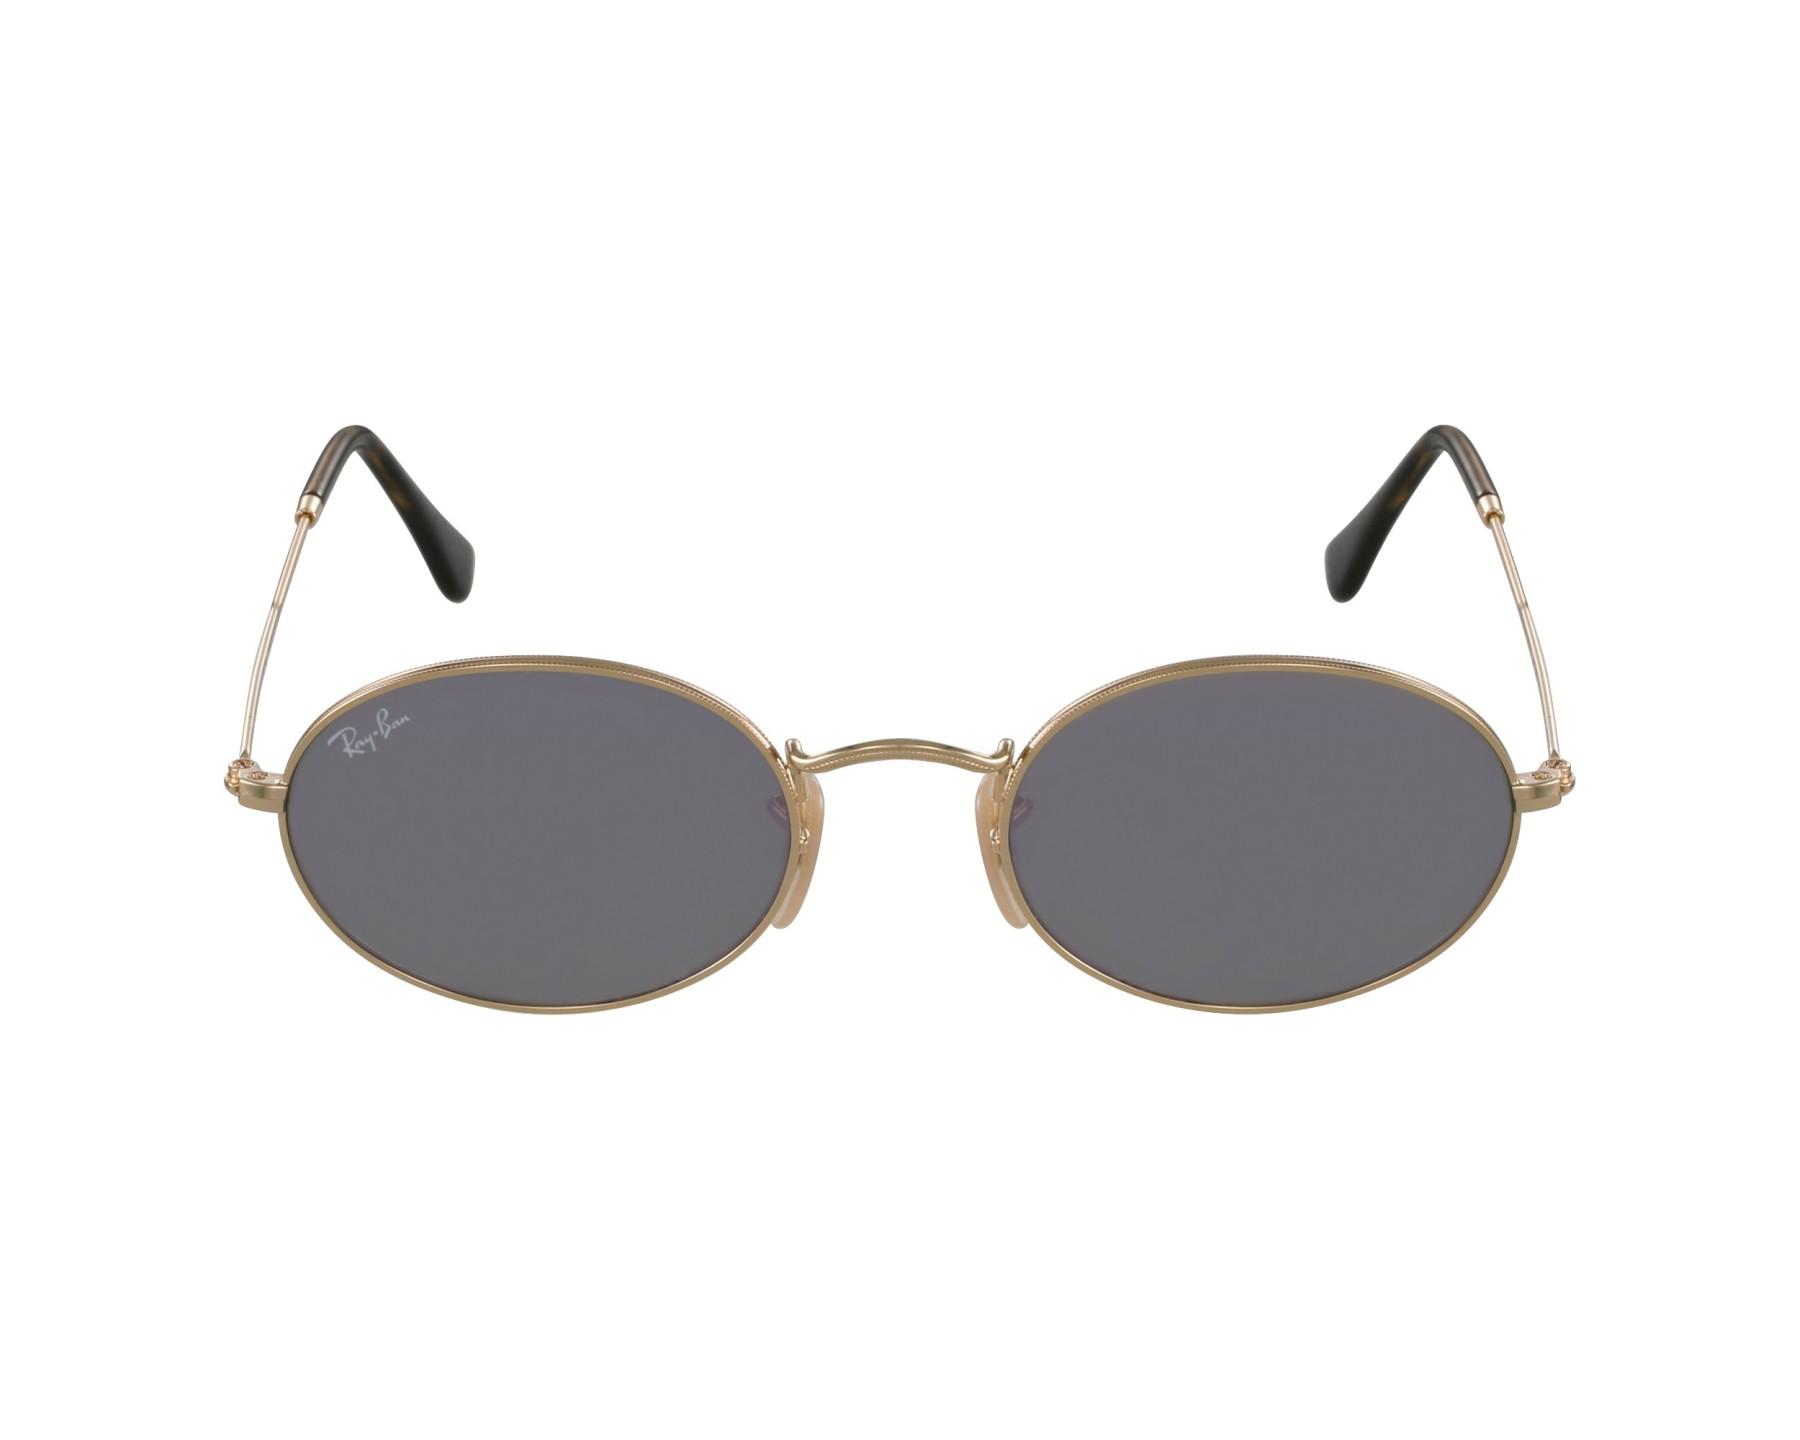 c7e6b96a28 Sunglasses Ray-Ban RB-3547-N 001 8O - Gold profile view